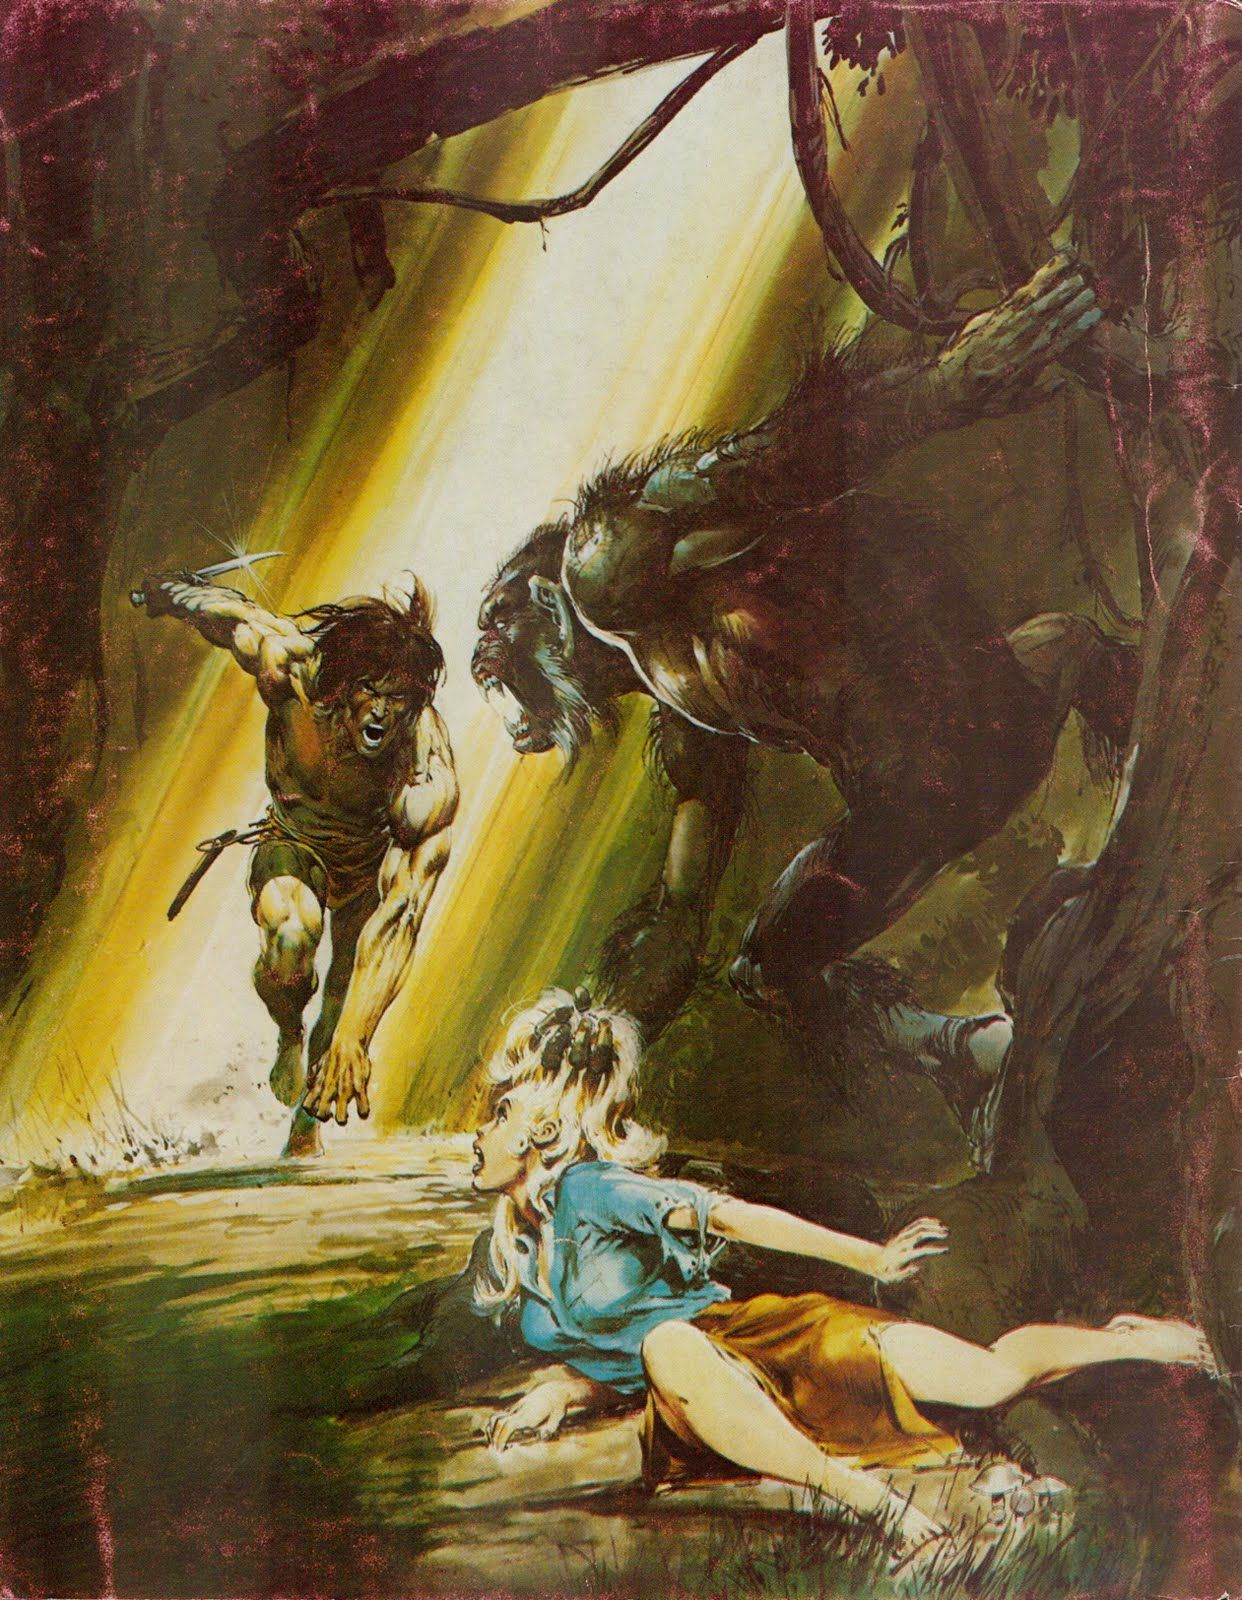 Neal Adams Tarzan Illustration, Late 70's.